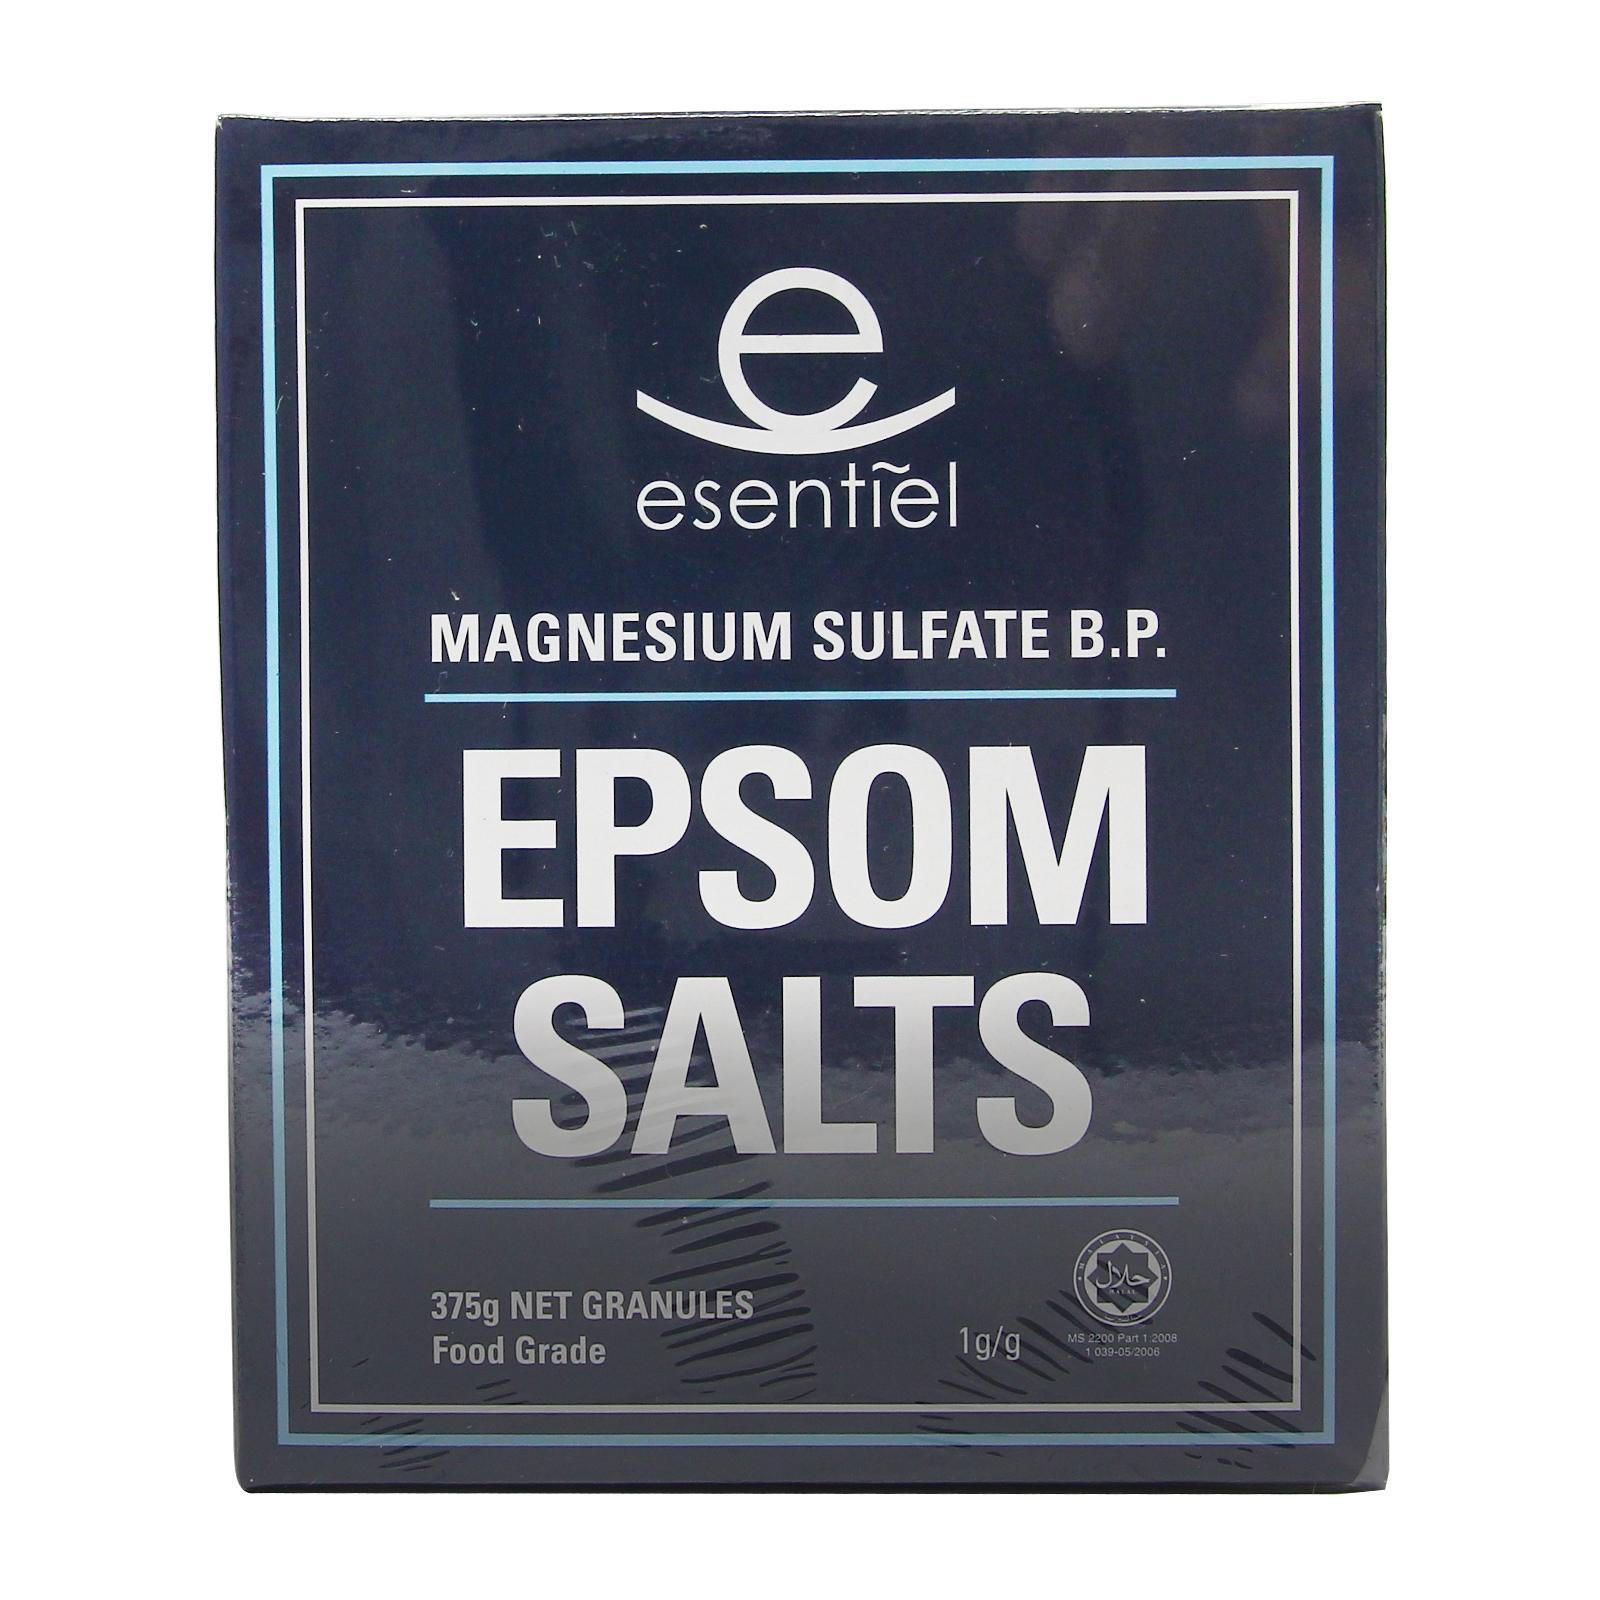 Essential Epsom Salts